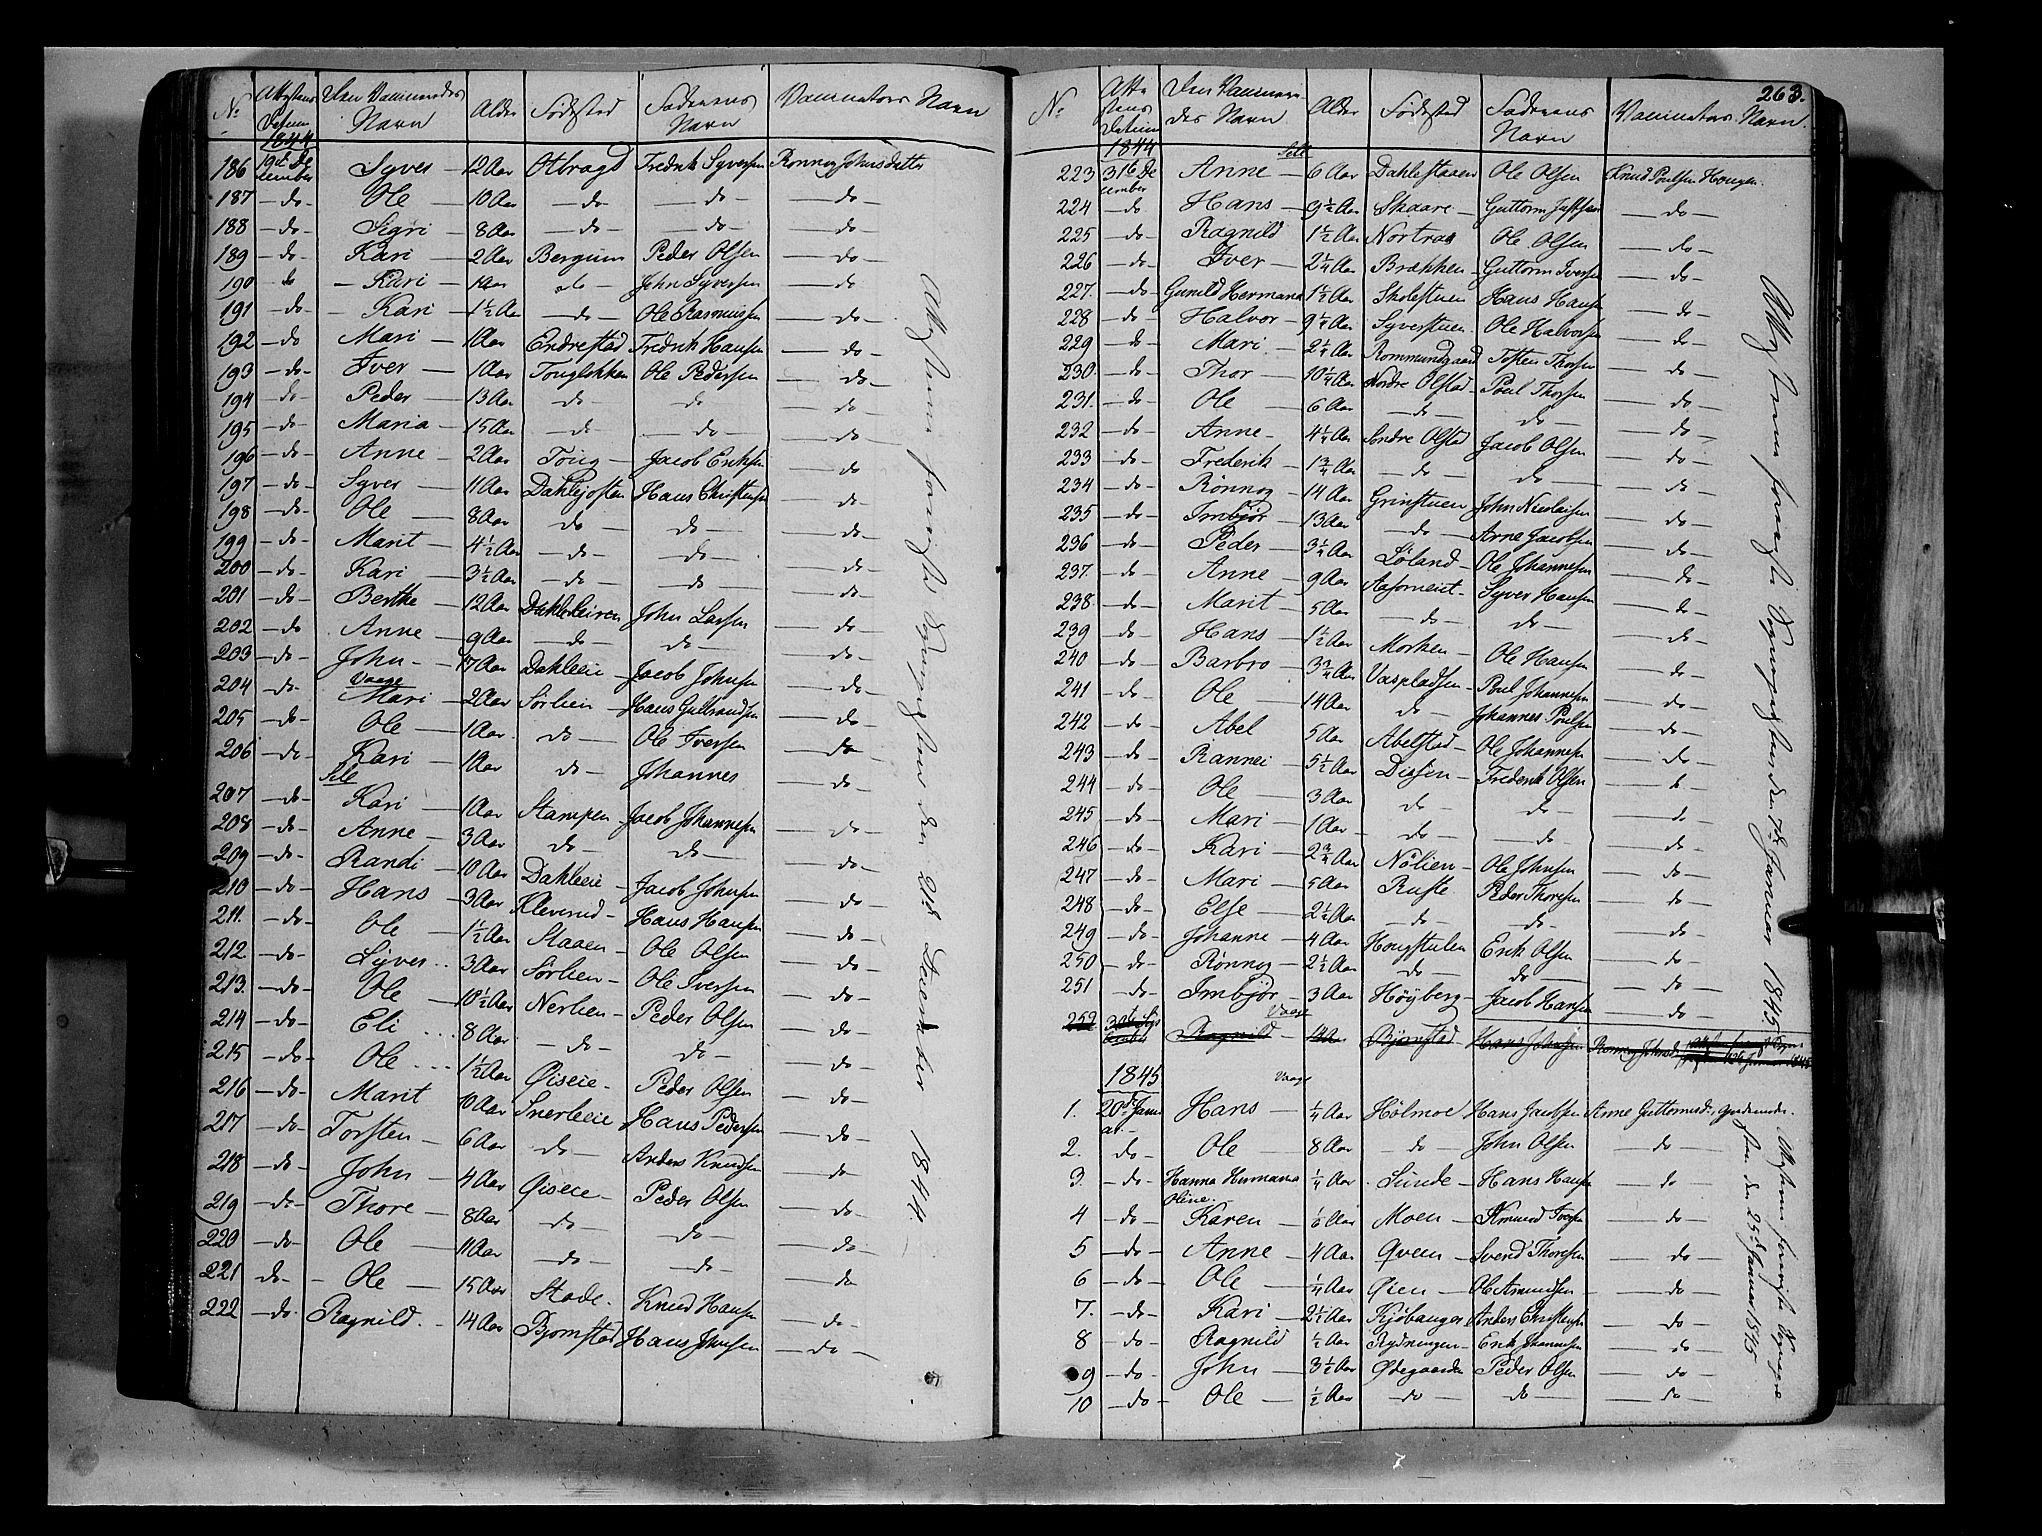 SAH, Vågå prestekontor, Ministerialbok nr. 5 /1, 1842-1856, s. 263